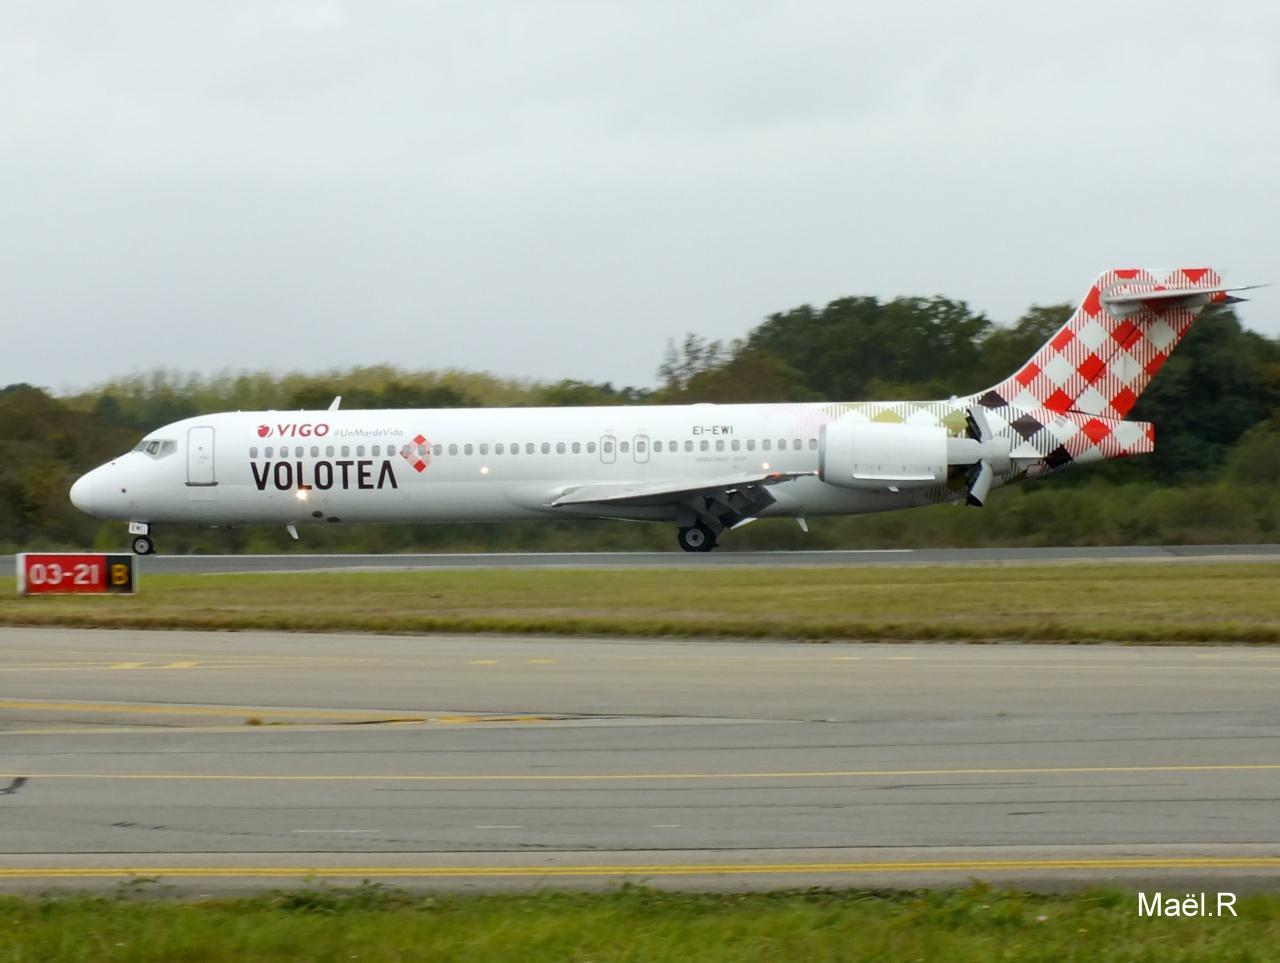 [18/09/2014] Boeing B717 (EI-EWI) Volotea: VIGO #UnMardeVida! 566547Octobren2036